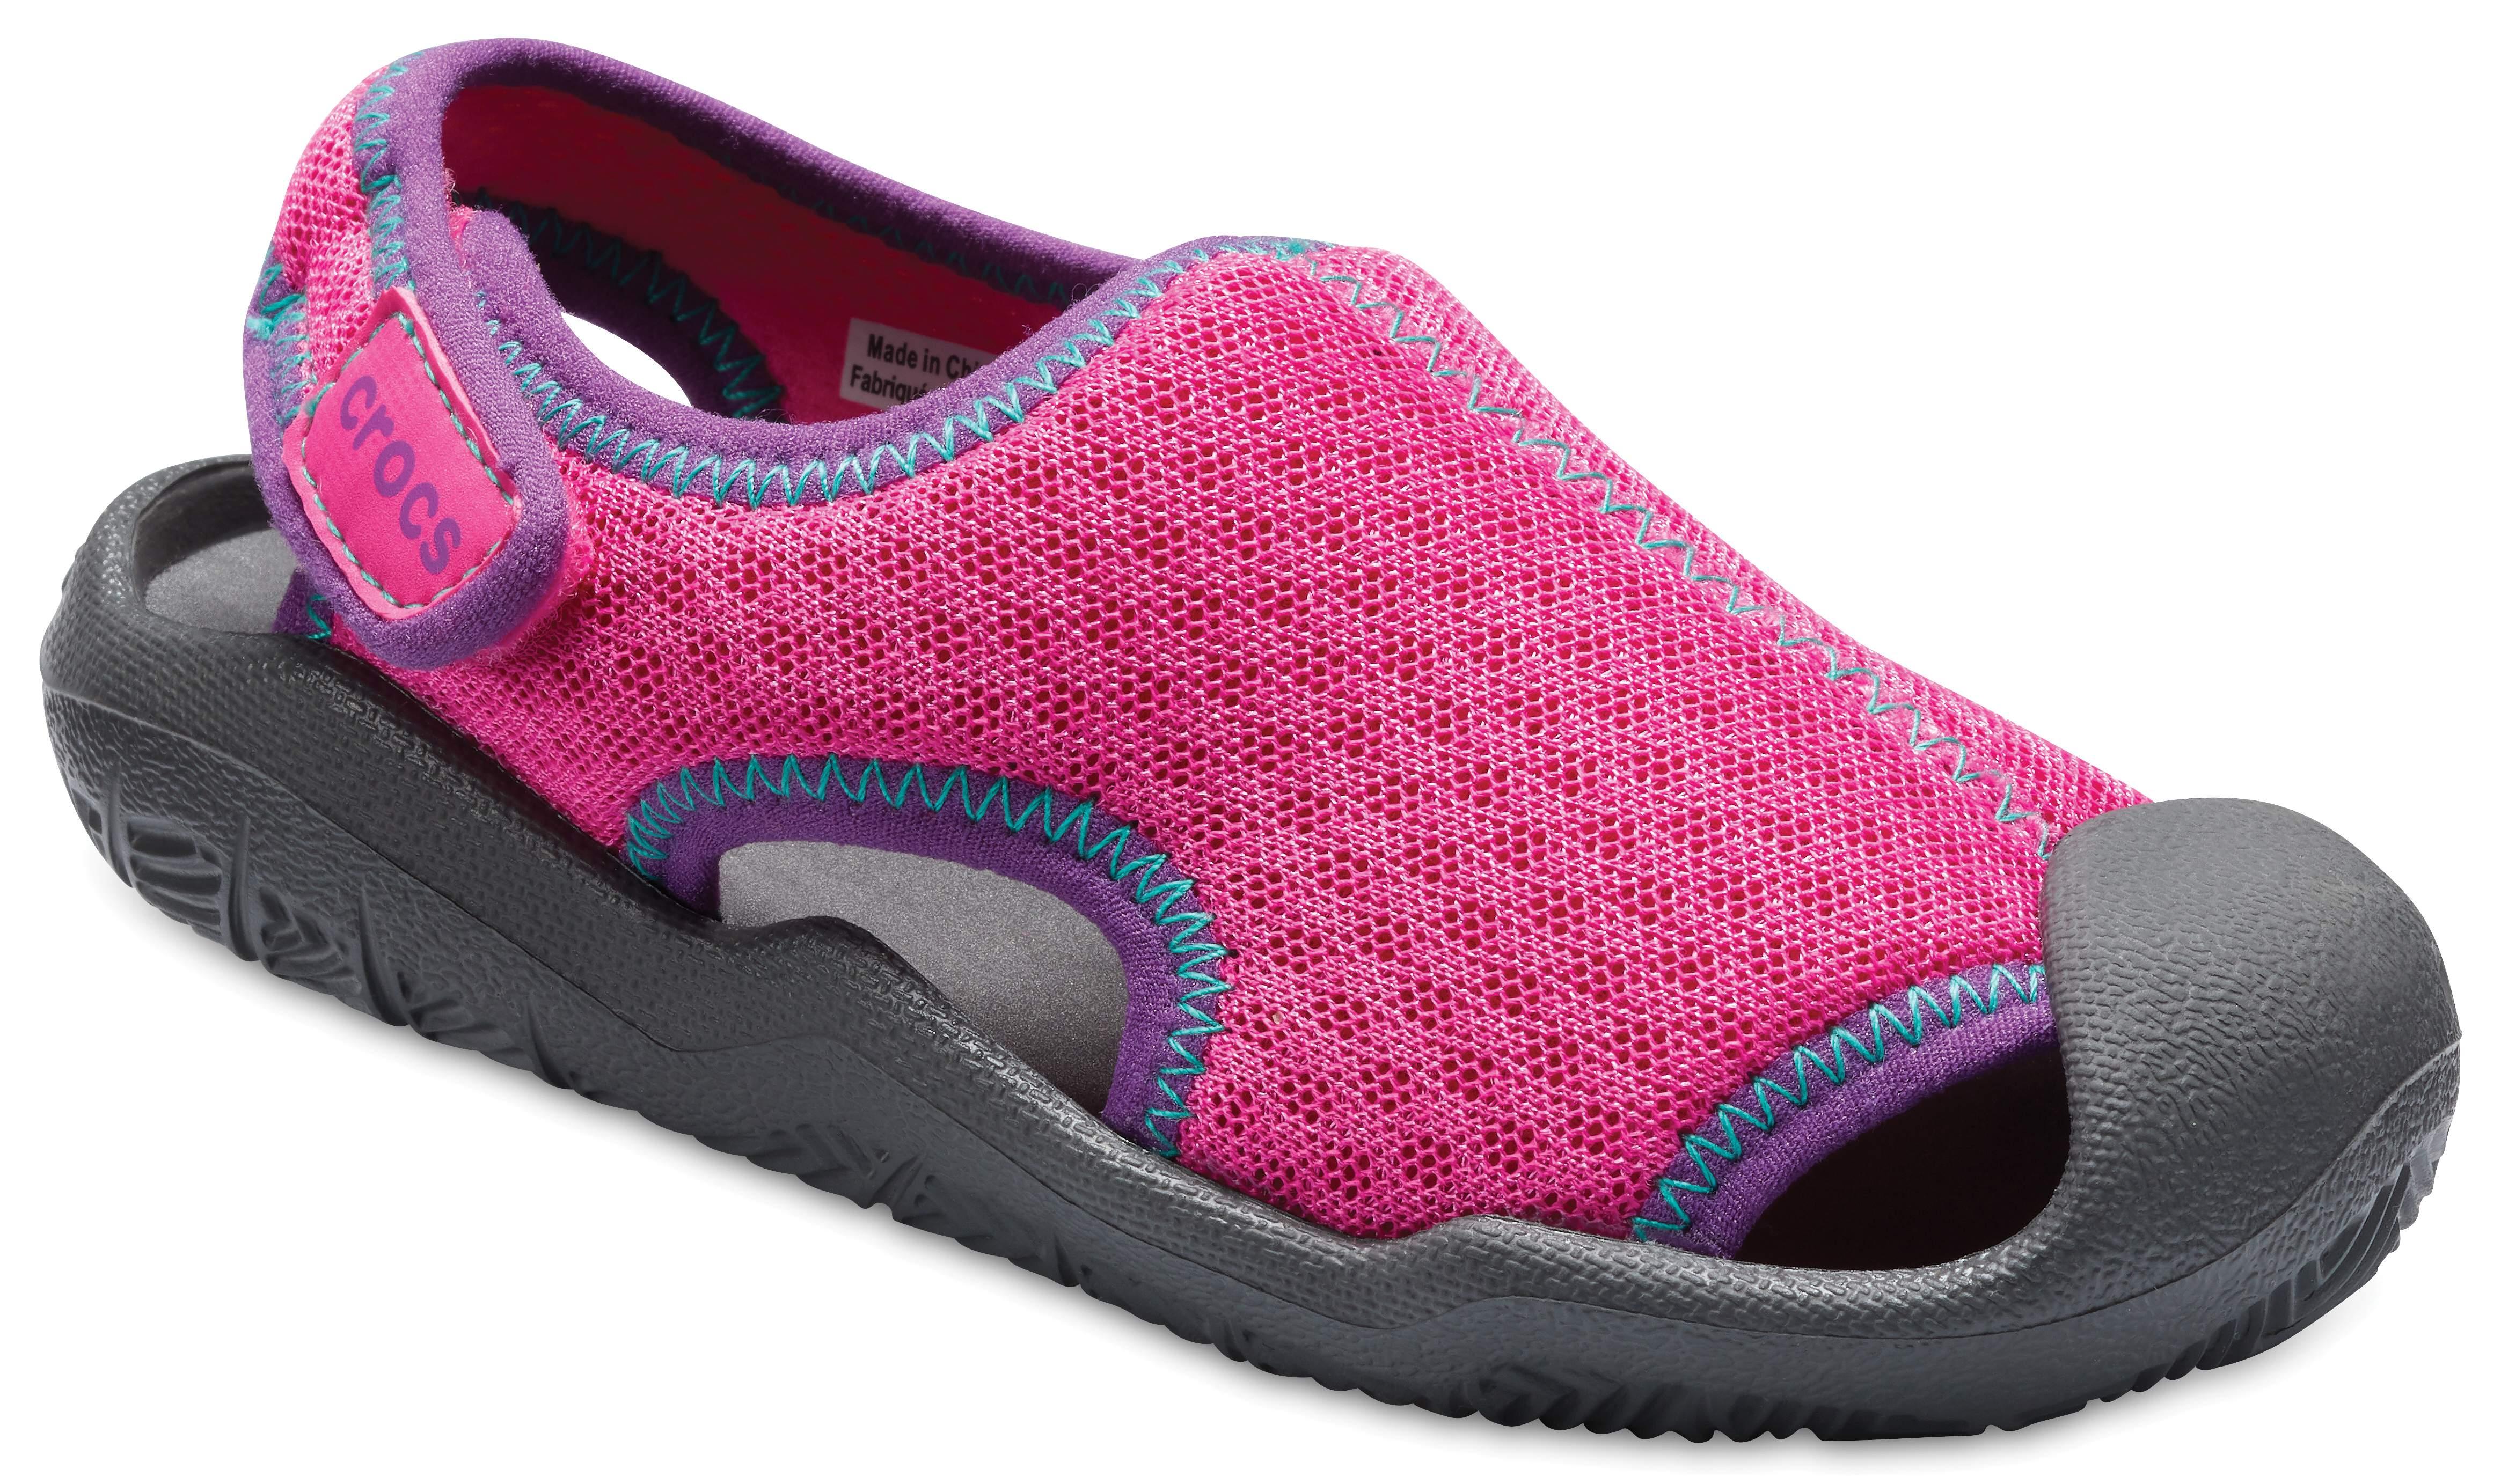 Crocs Kids' Swiftwater™ Easy-On Heathered Shoe Children Girls Boys